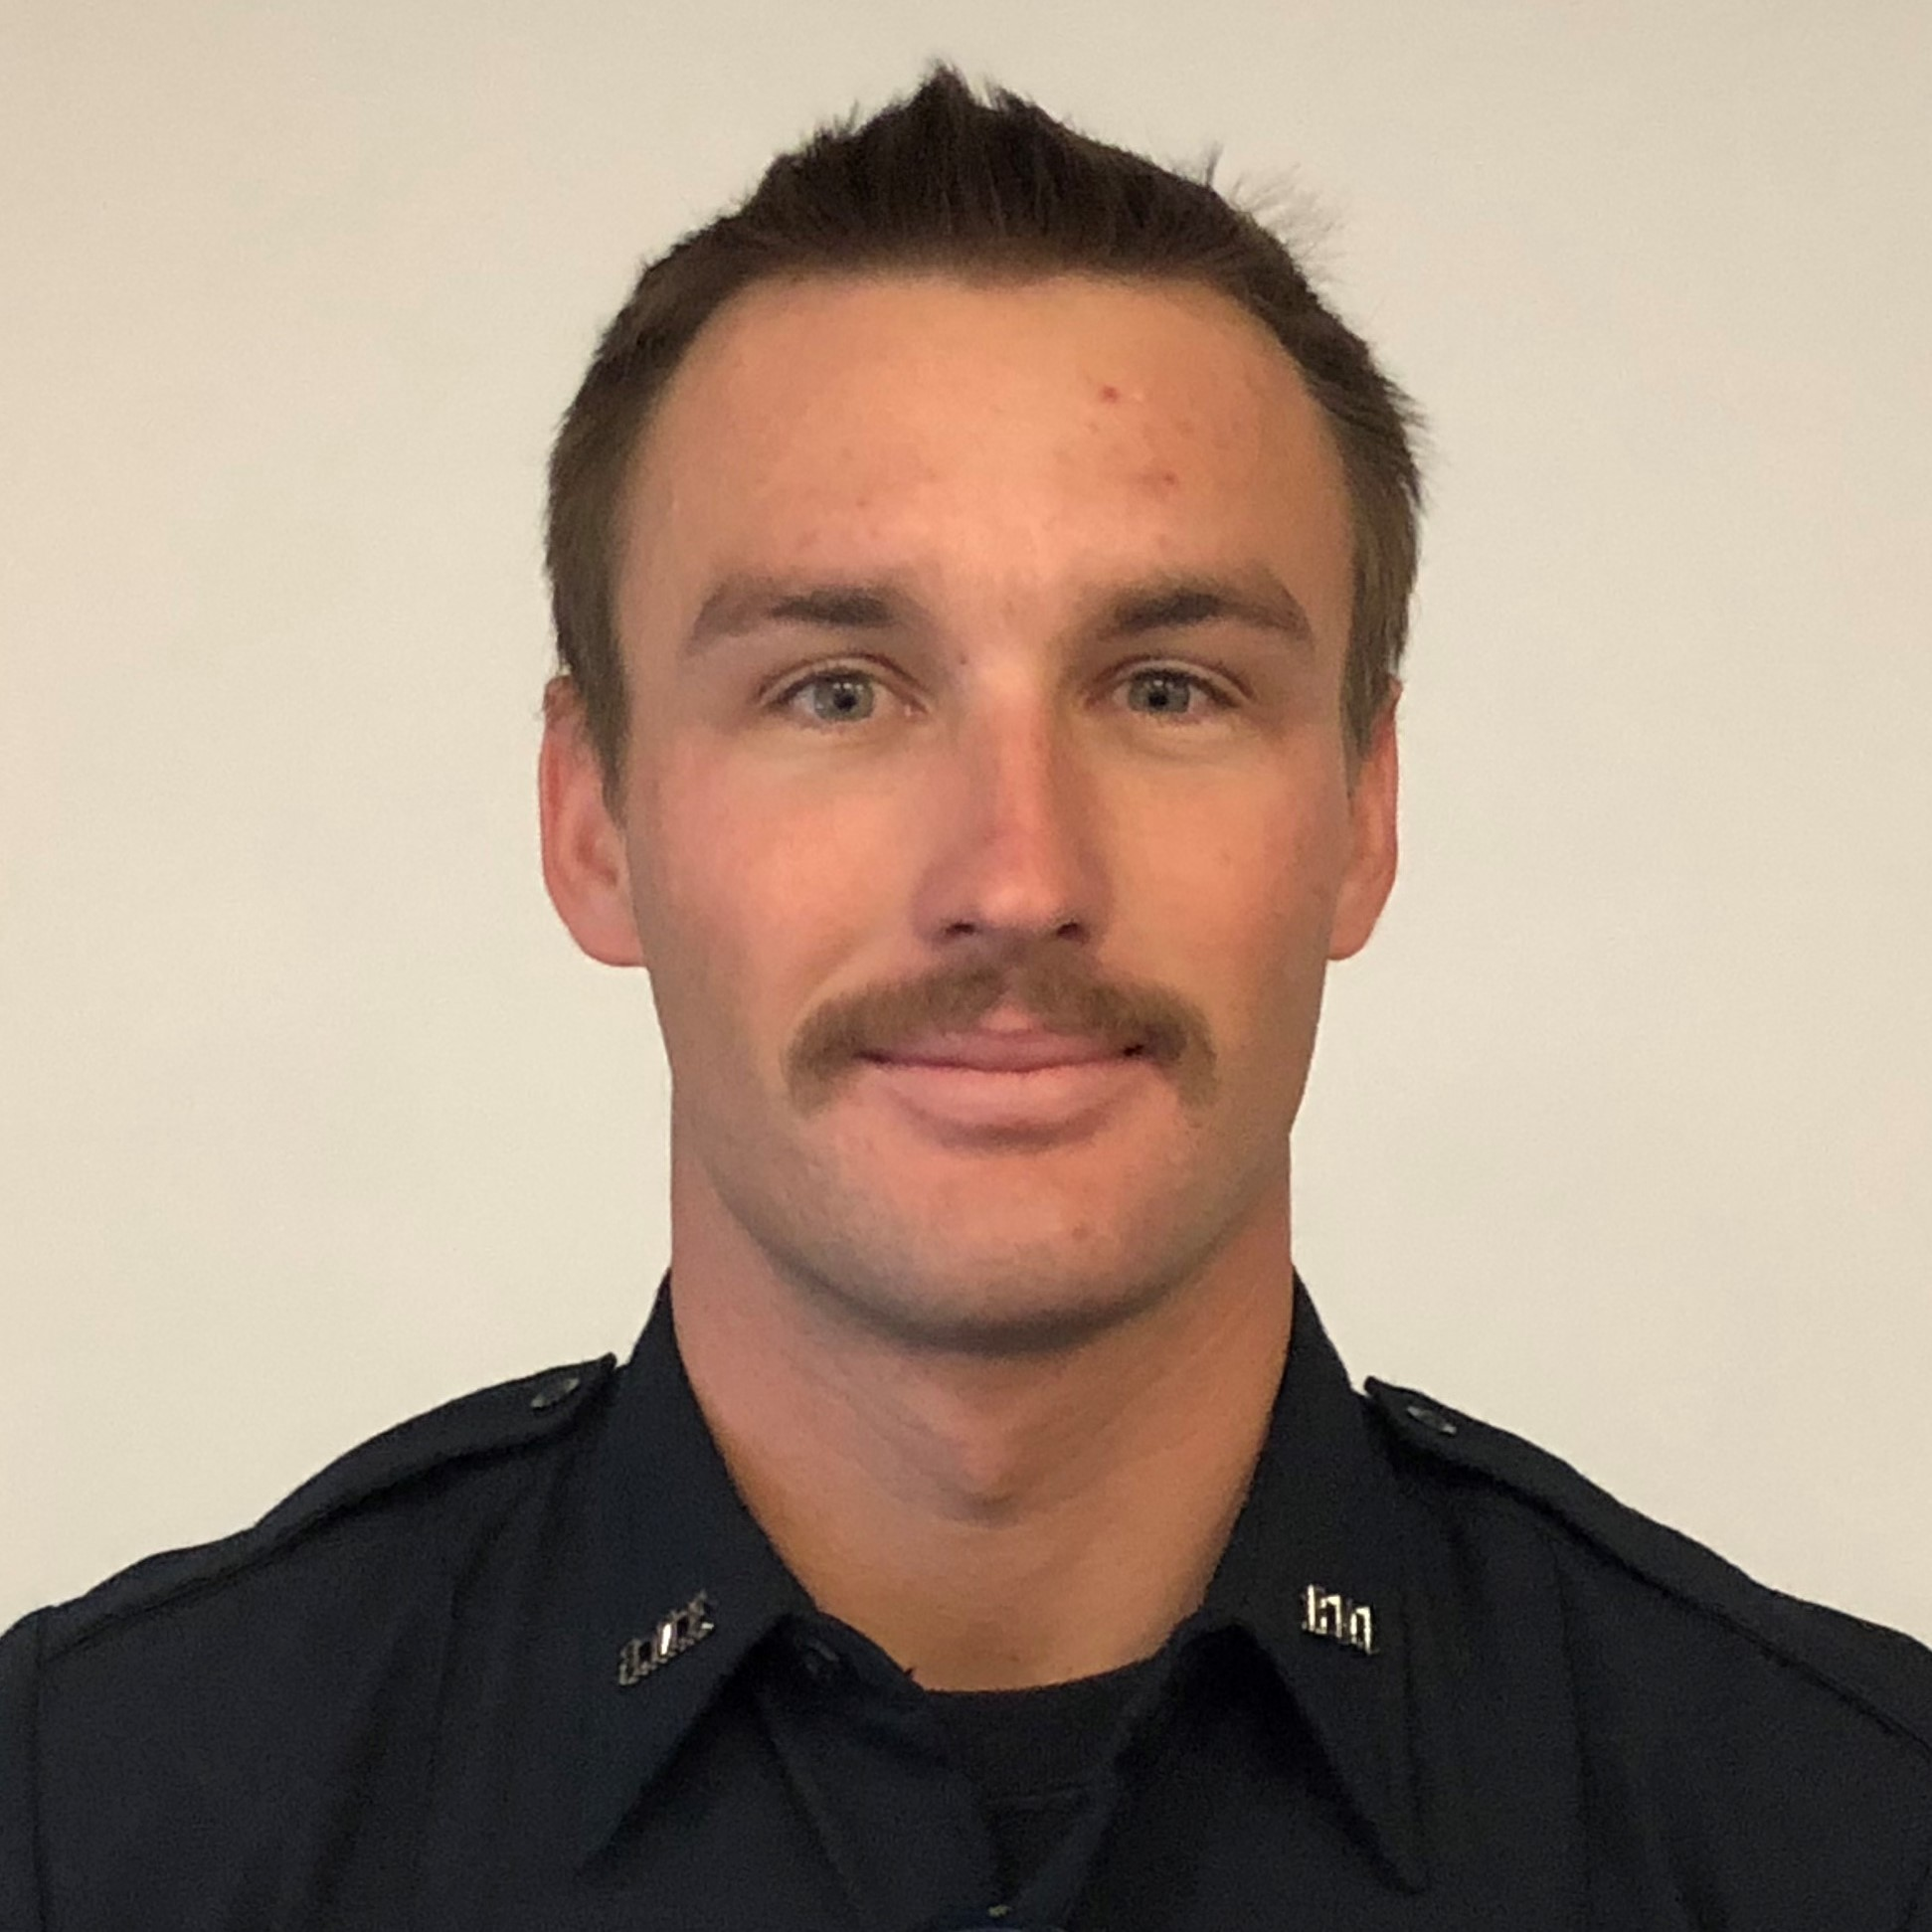 Firefighter - Andrew Dutchman